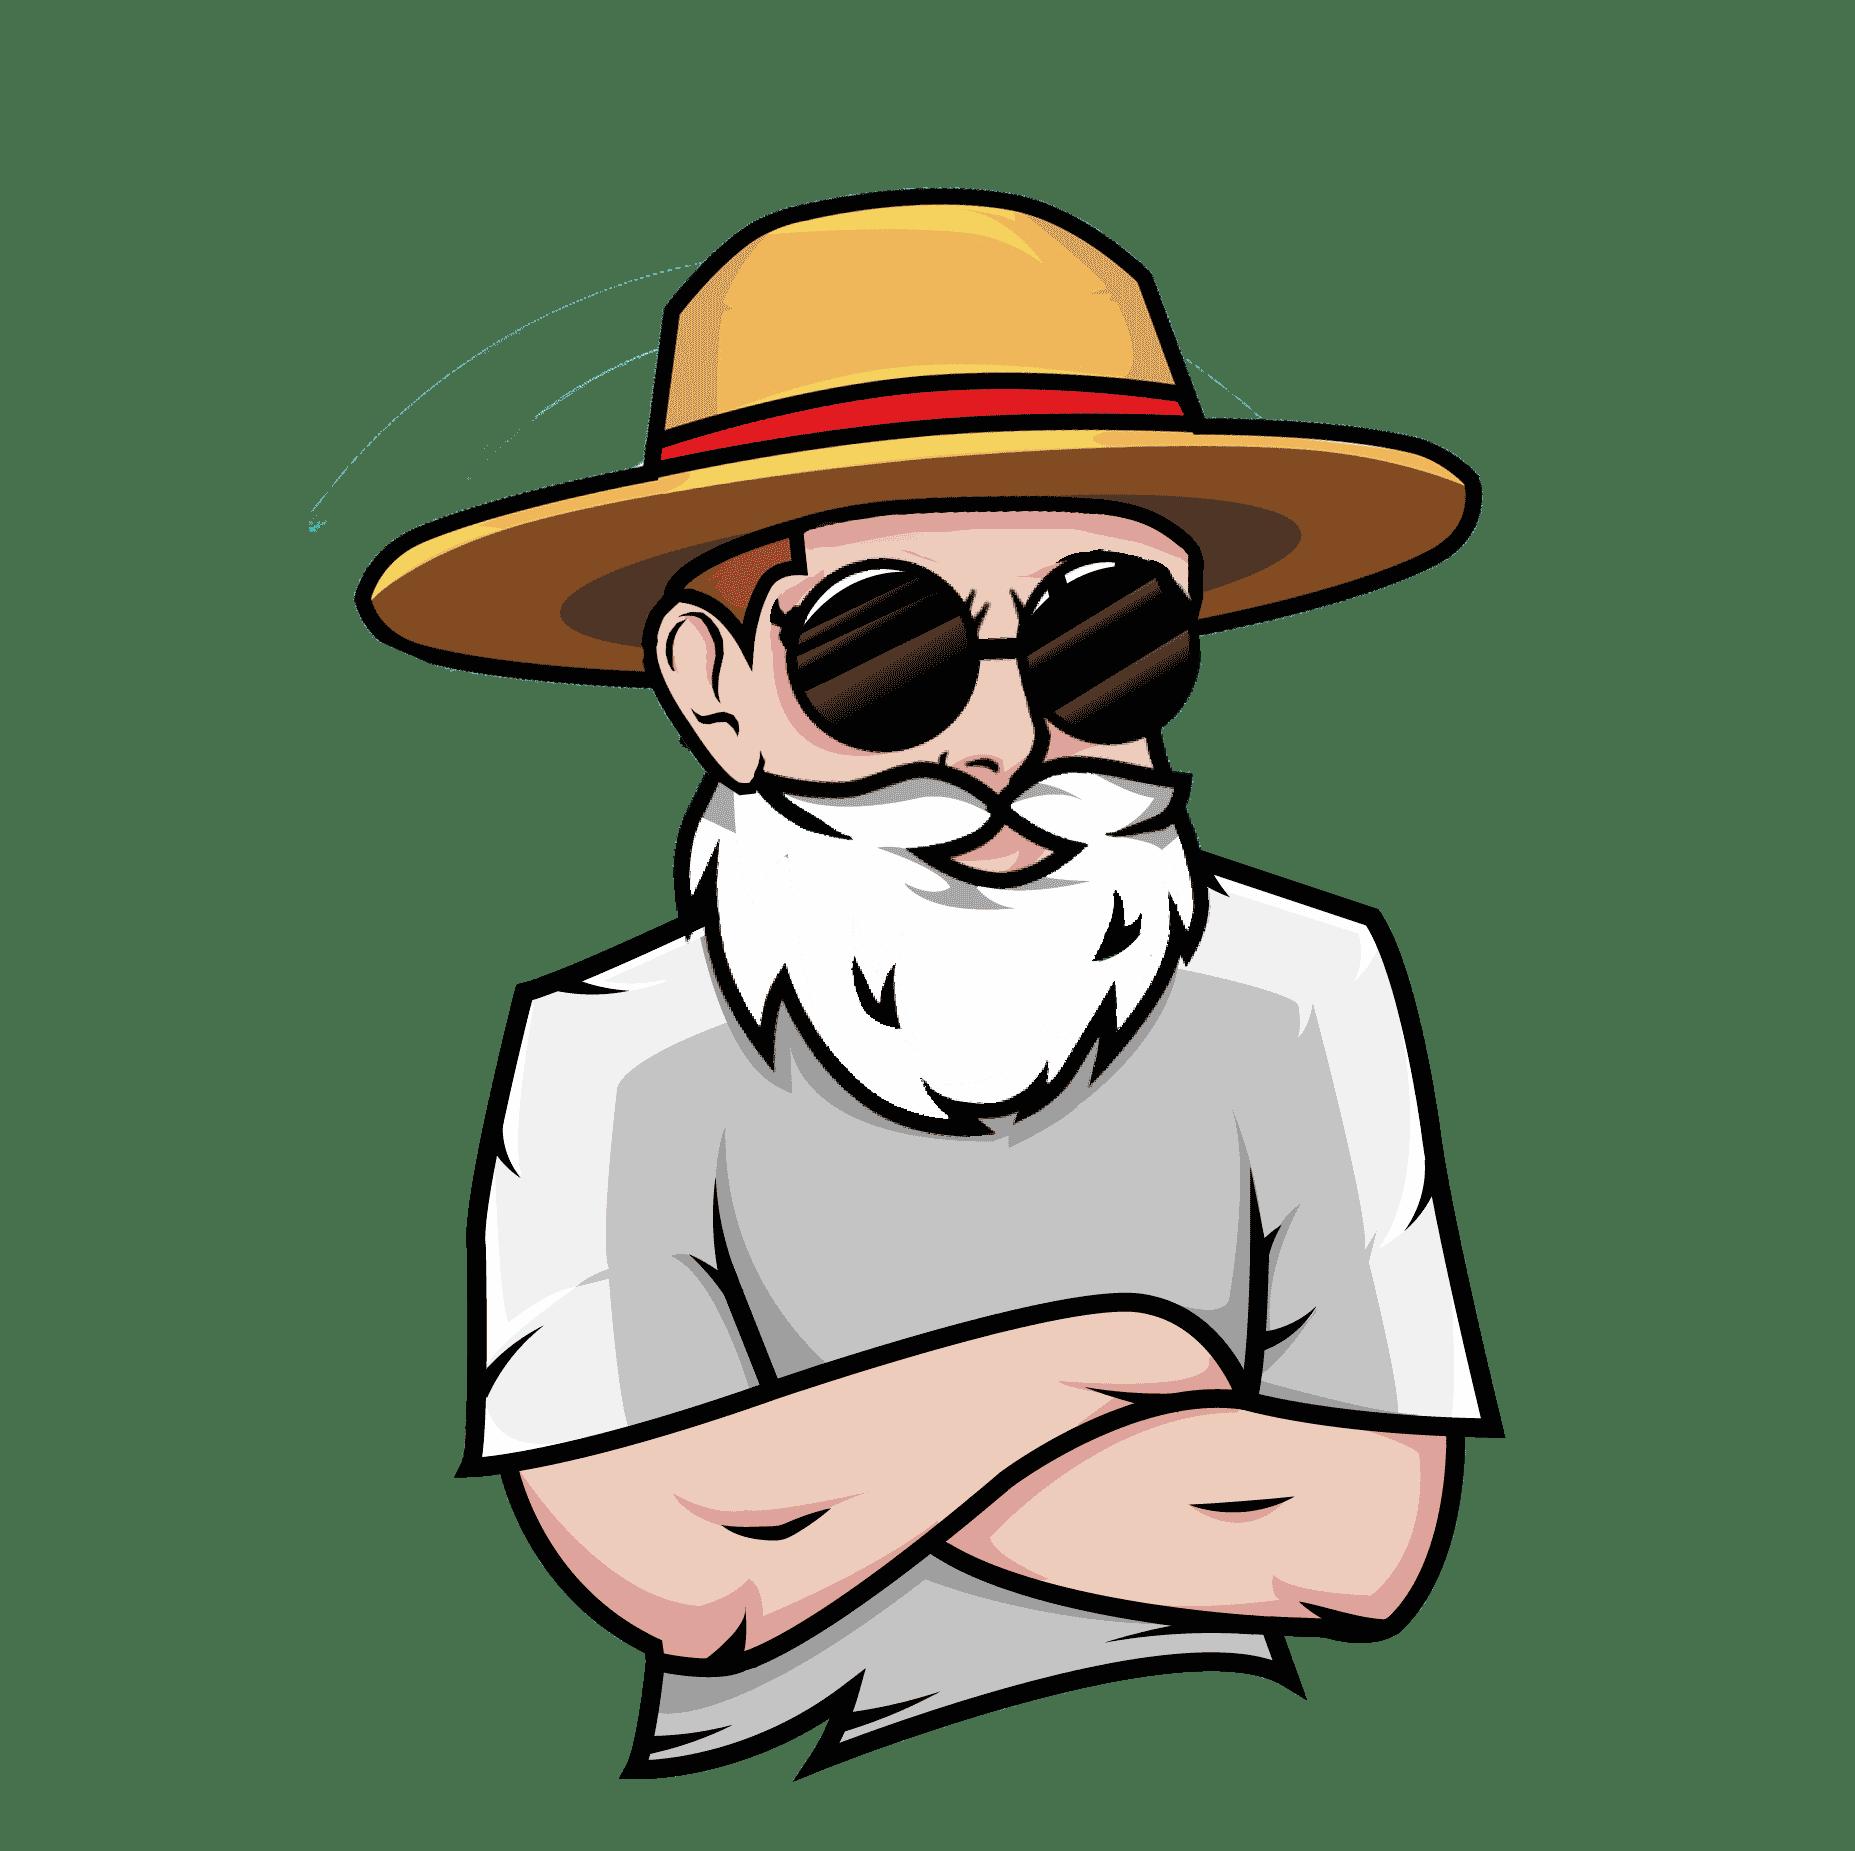 barba palha 2 Free Fire